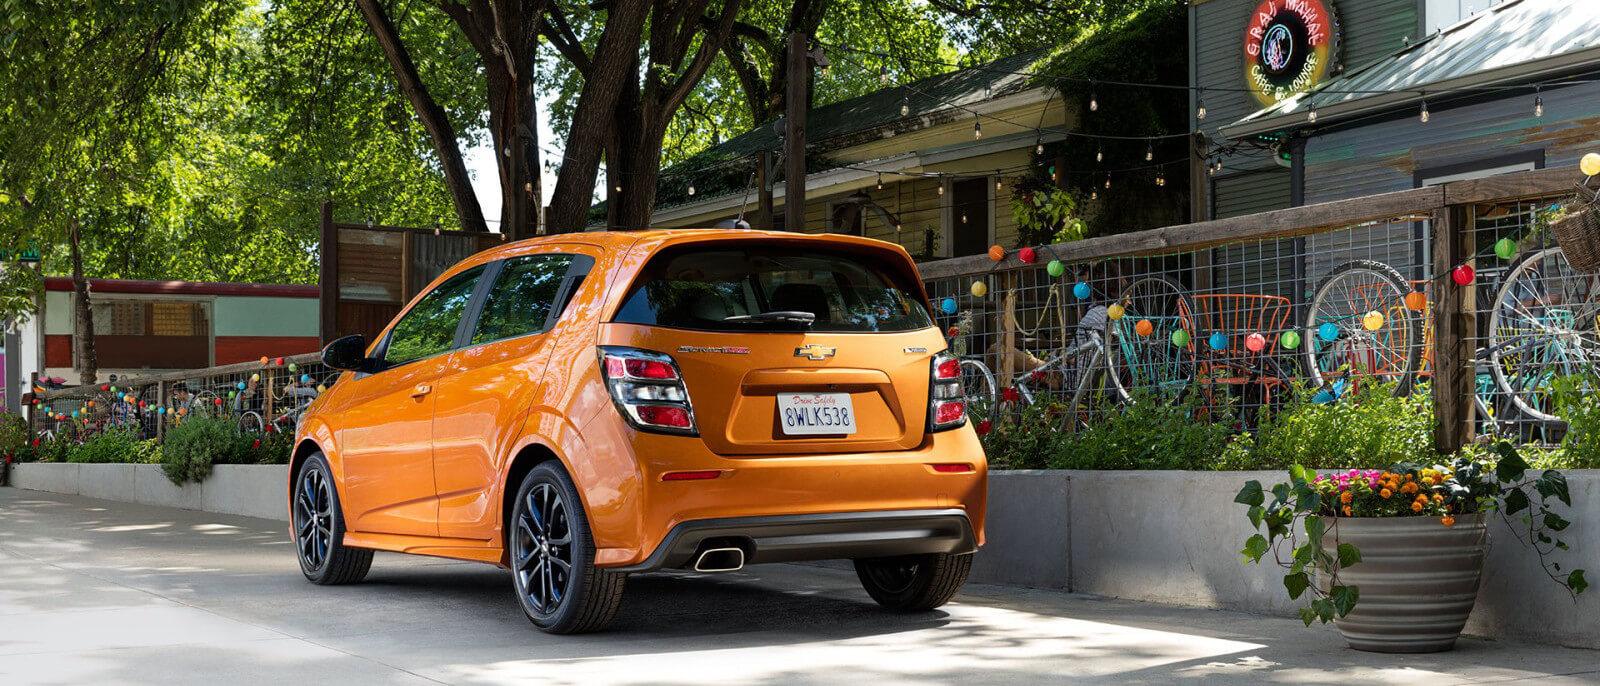 2017 Chevrolet Sonic rear exterior